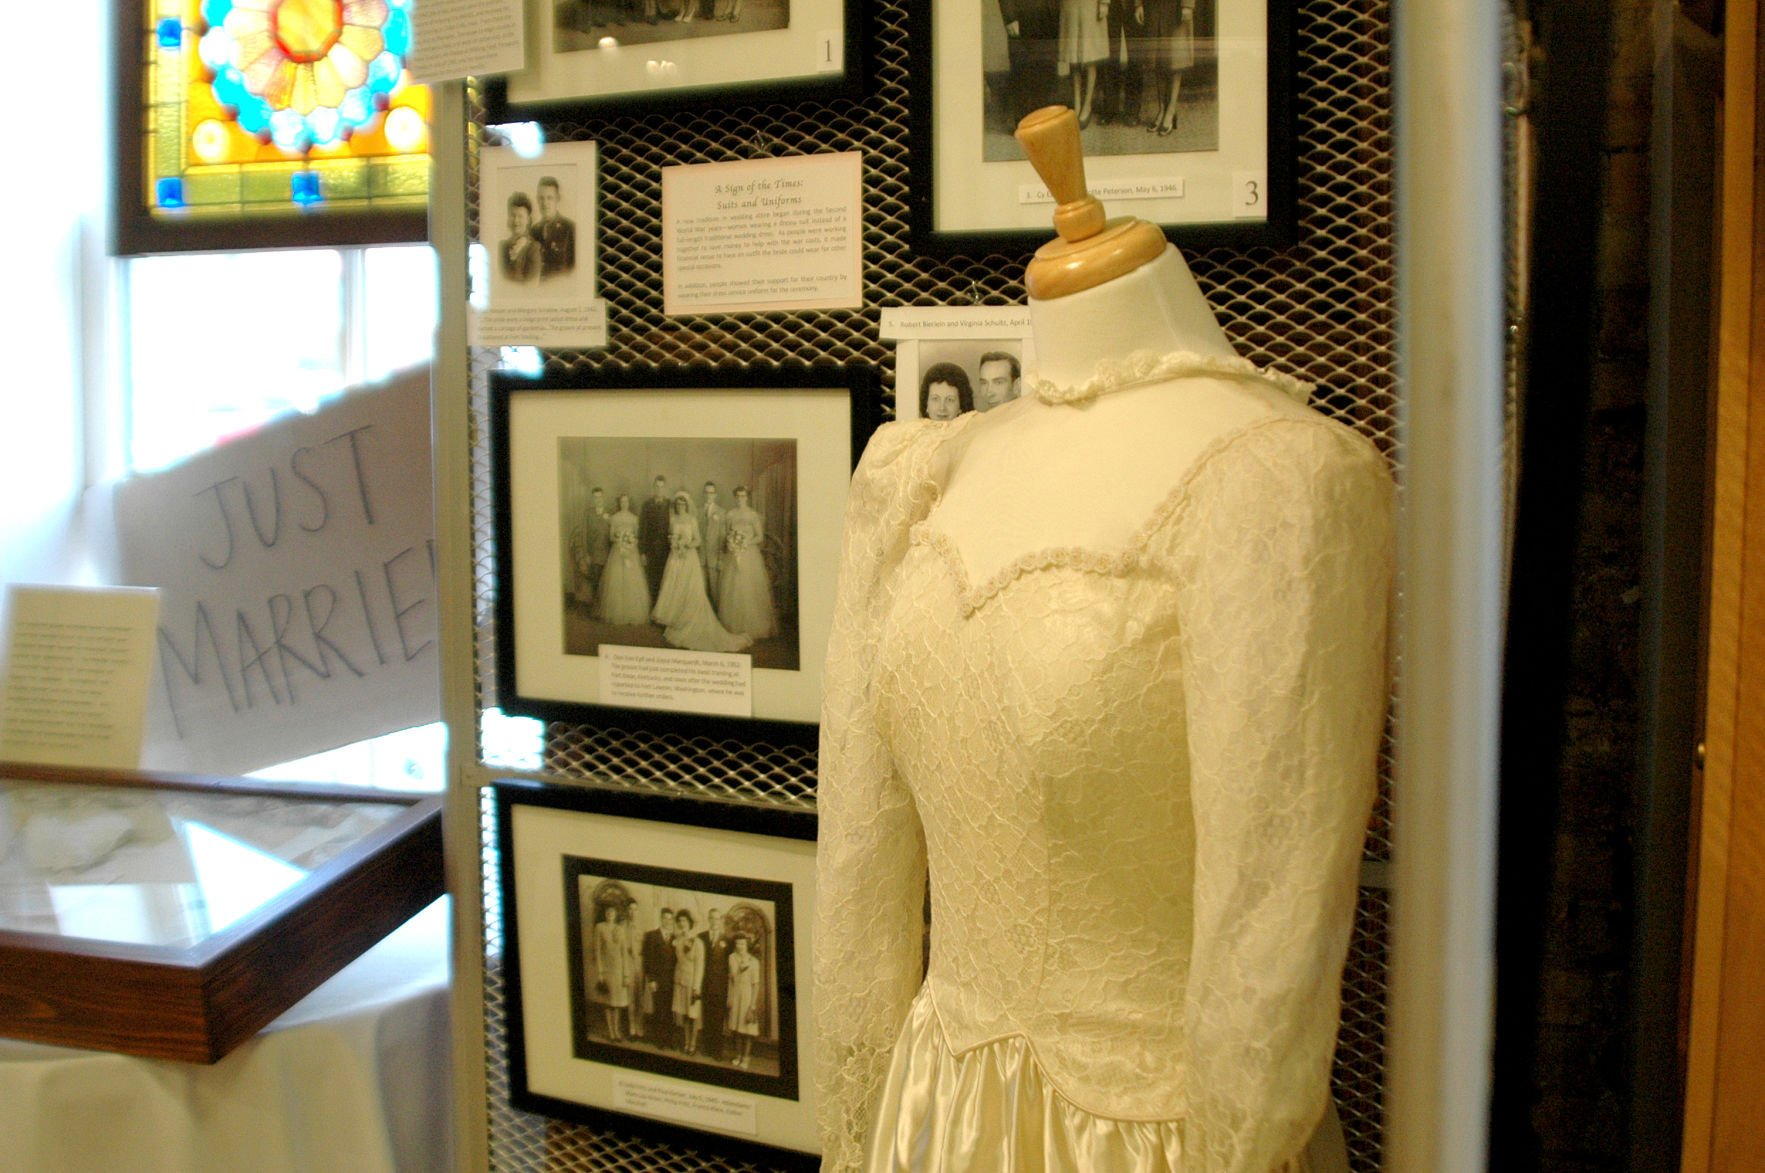 Wedding Dress At Historical Society: Wedding Dress Display Case At Reisefeber.org